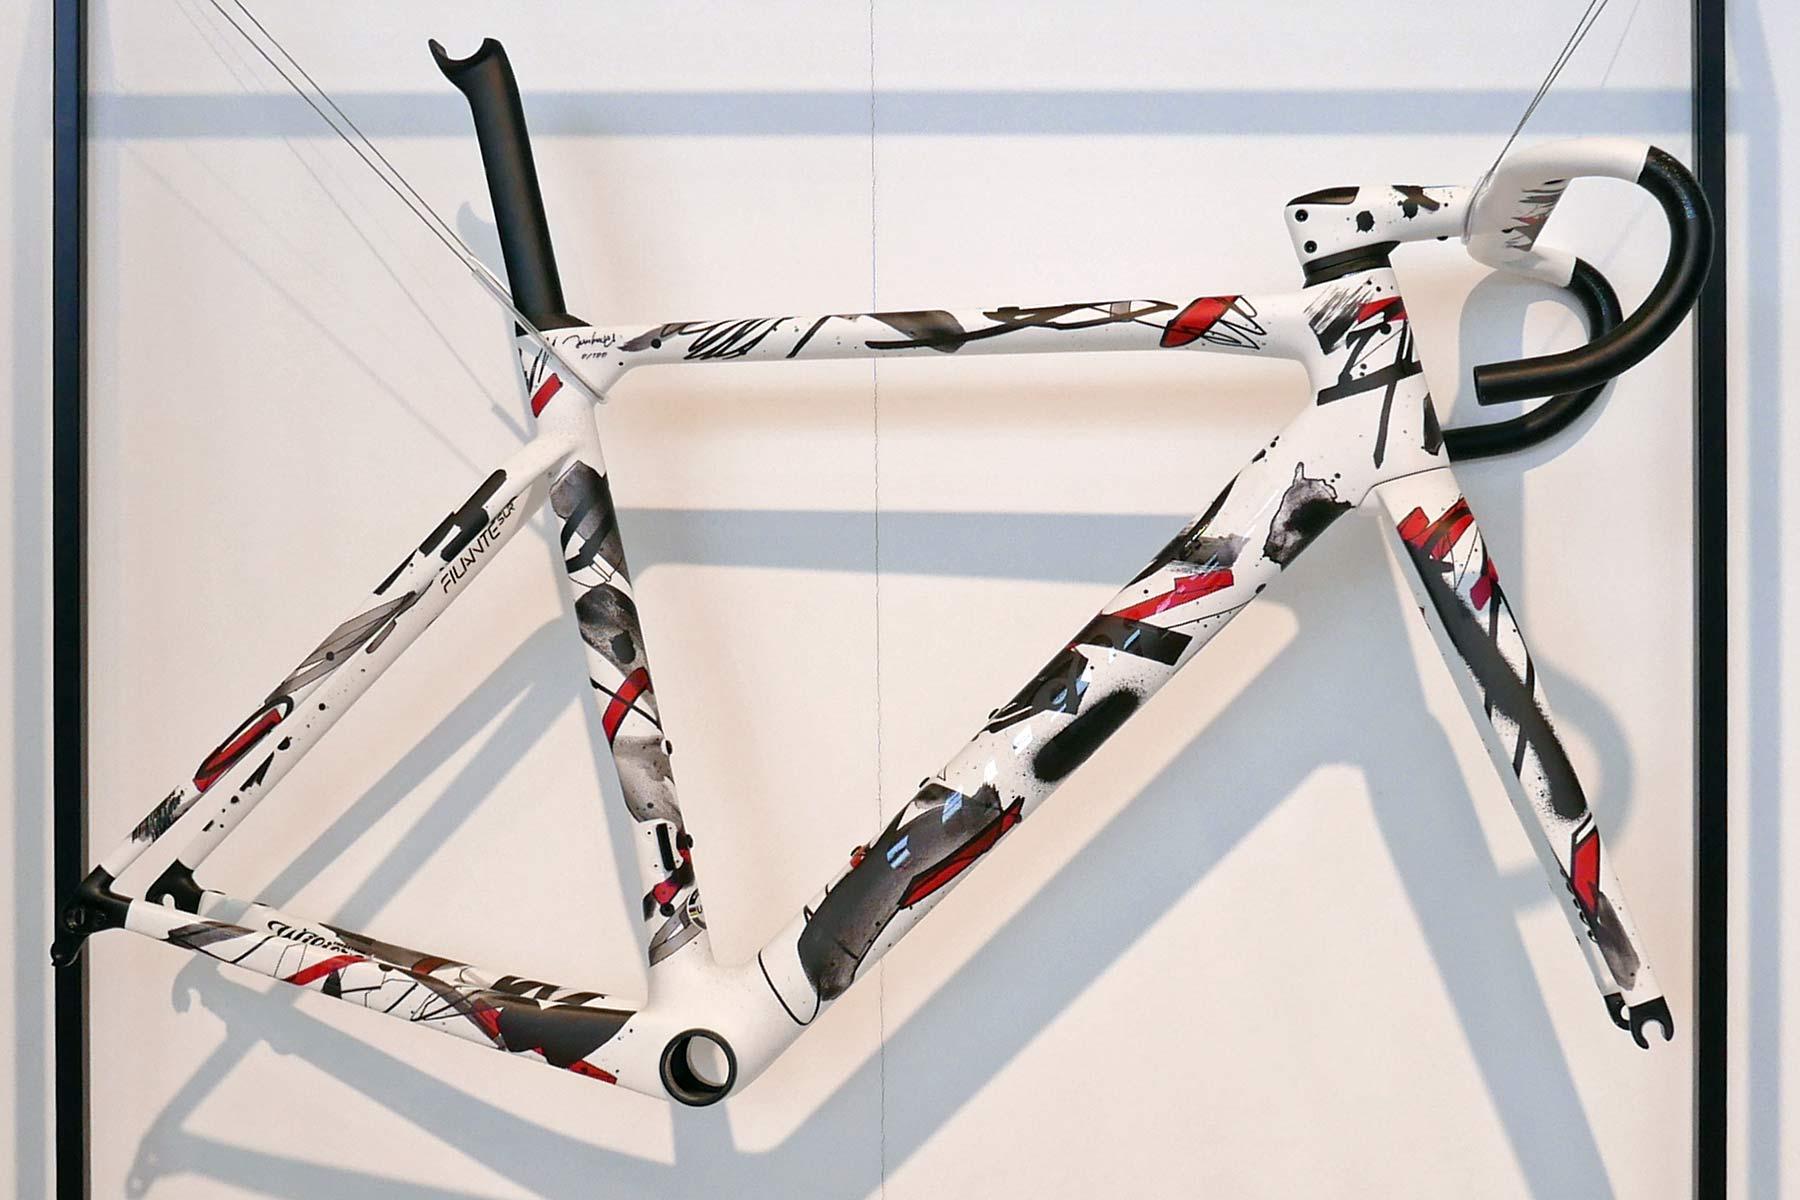 Wilier Unico, limited artist-series Filante SLR aero road bike, artwork by Jun Inoue